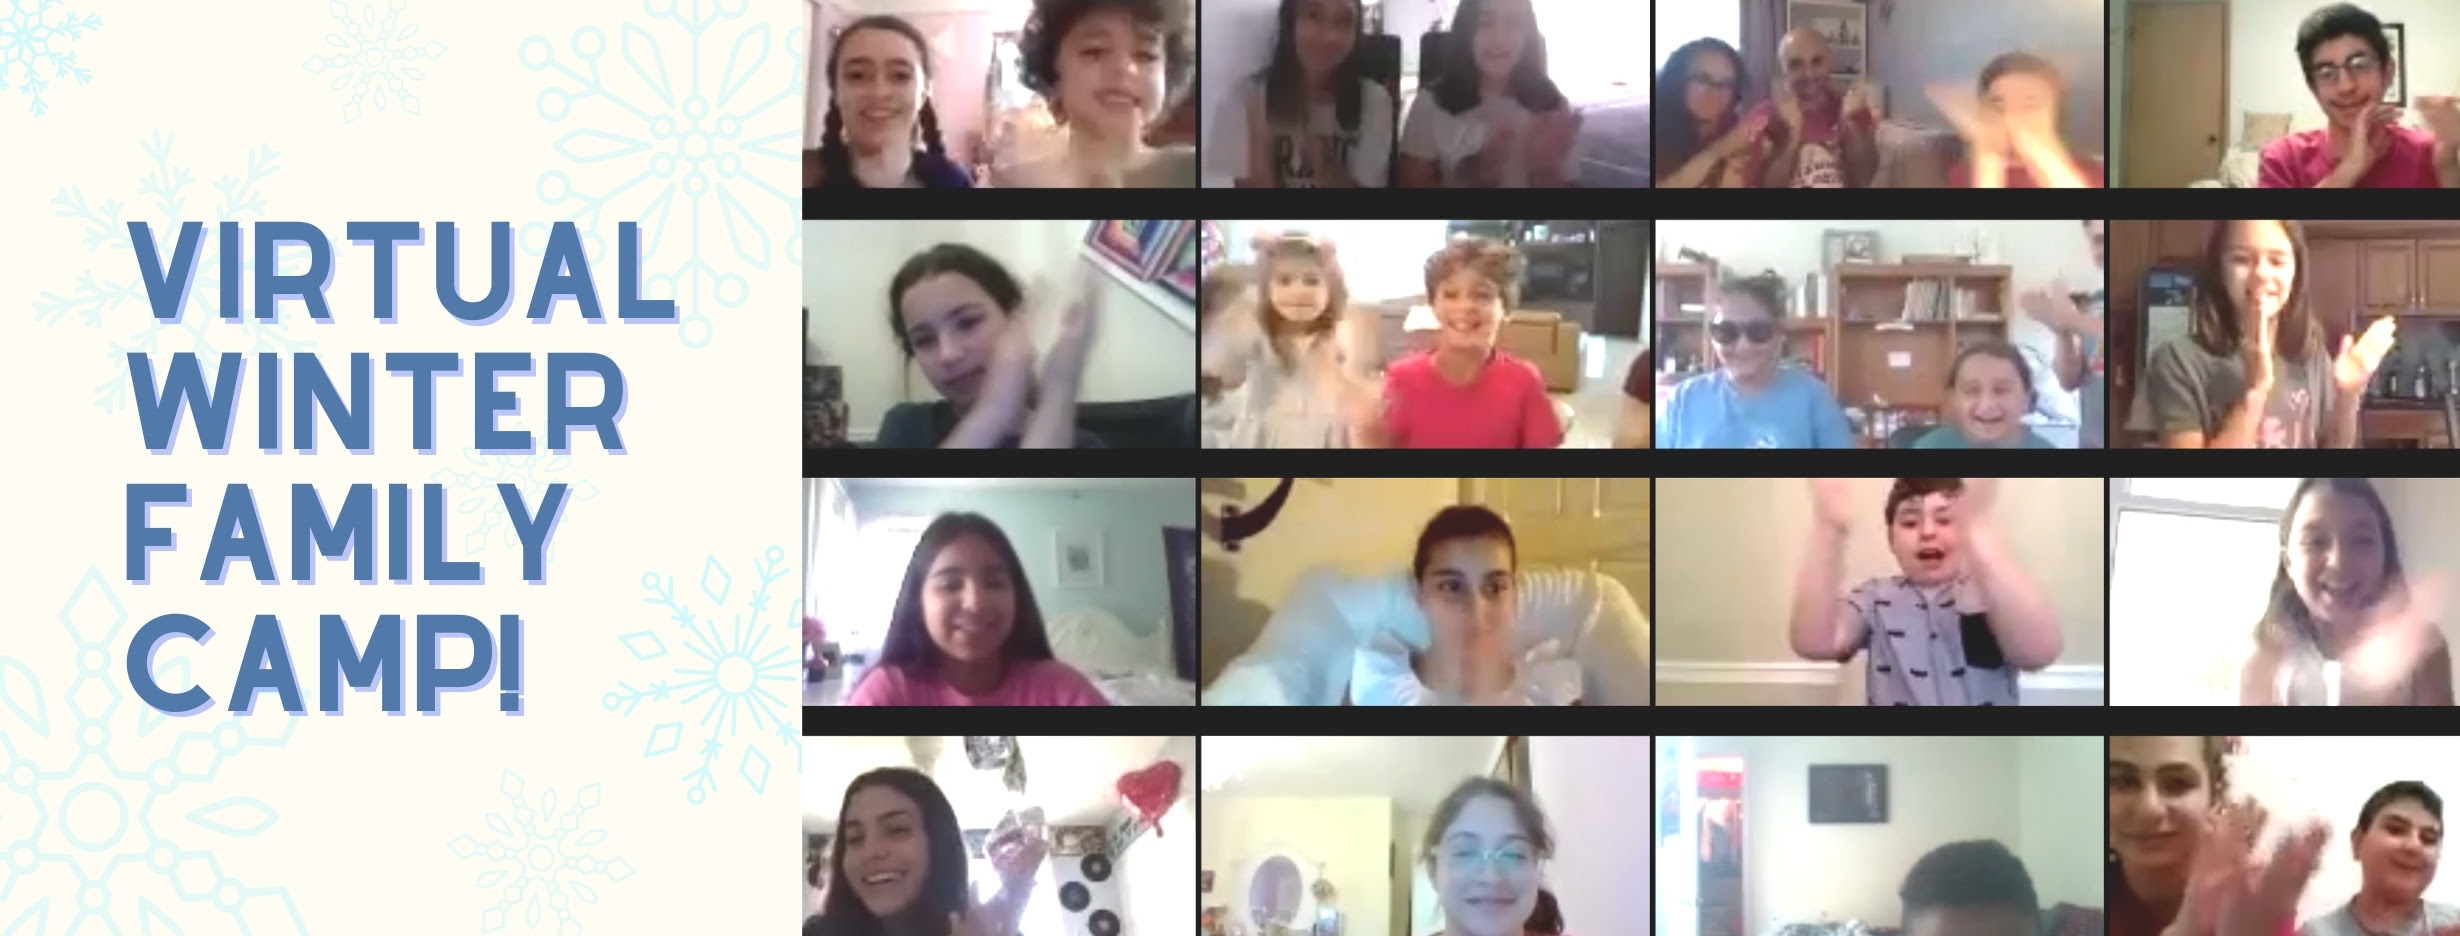 Virtual Winter Family Camp